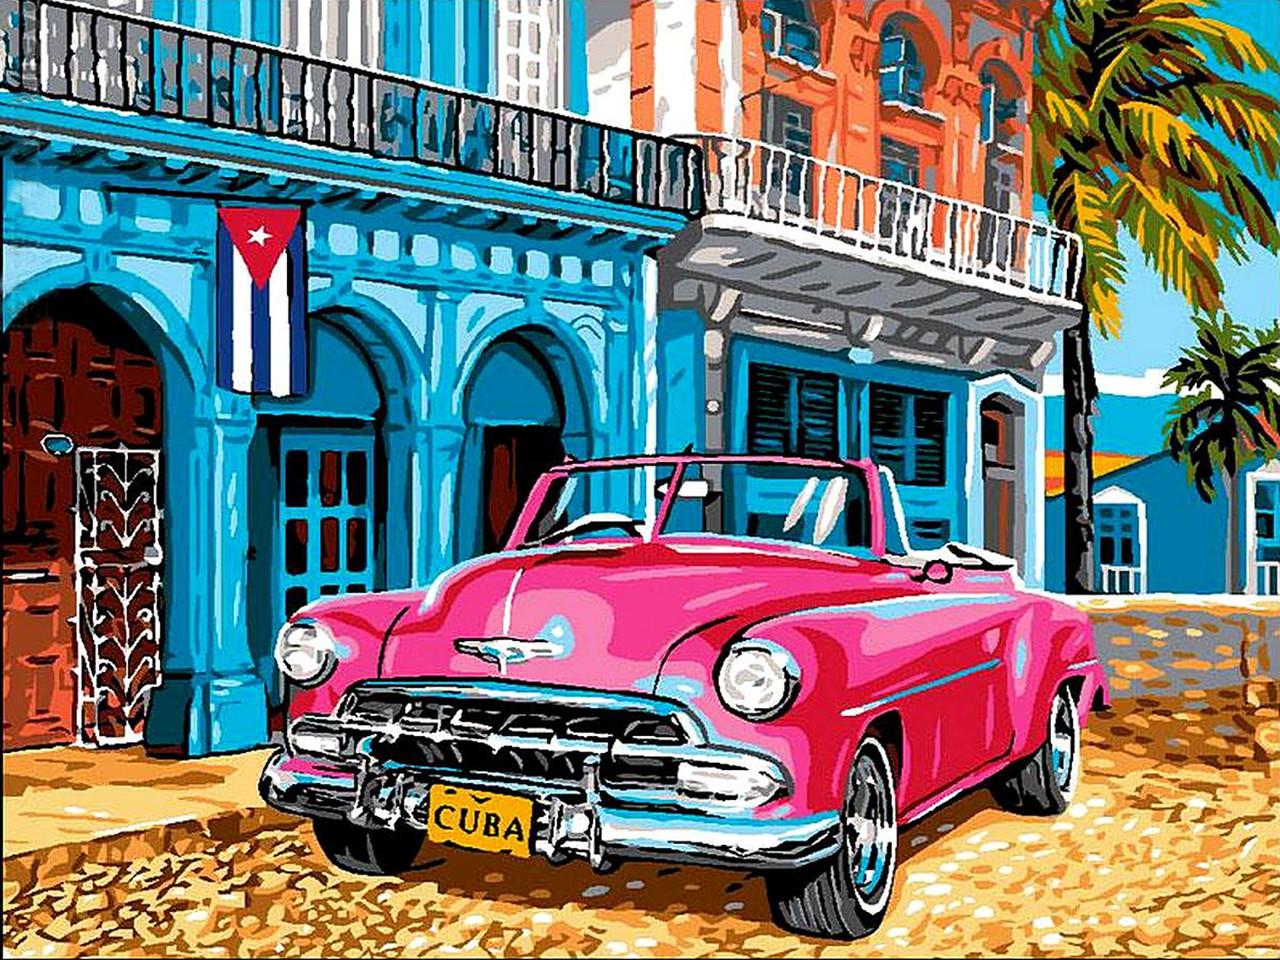 VK058 Раскраска по номерам Куба